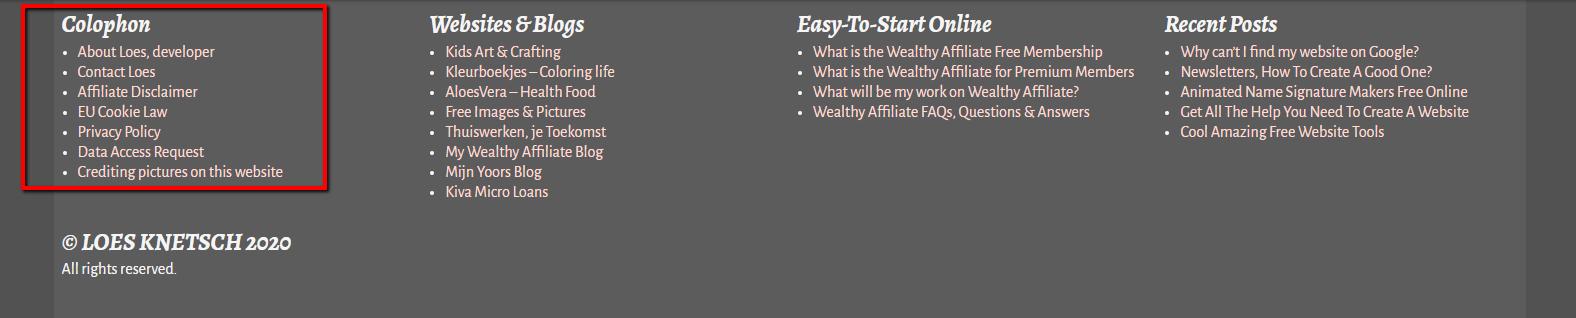 Recognize_Good_Business_Websites_2